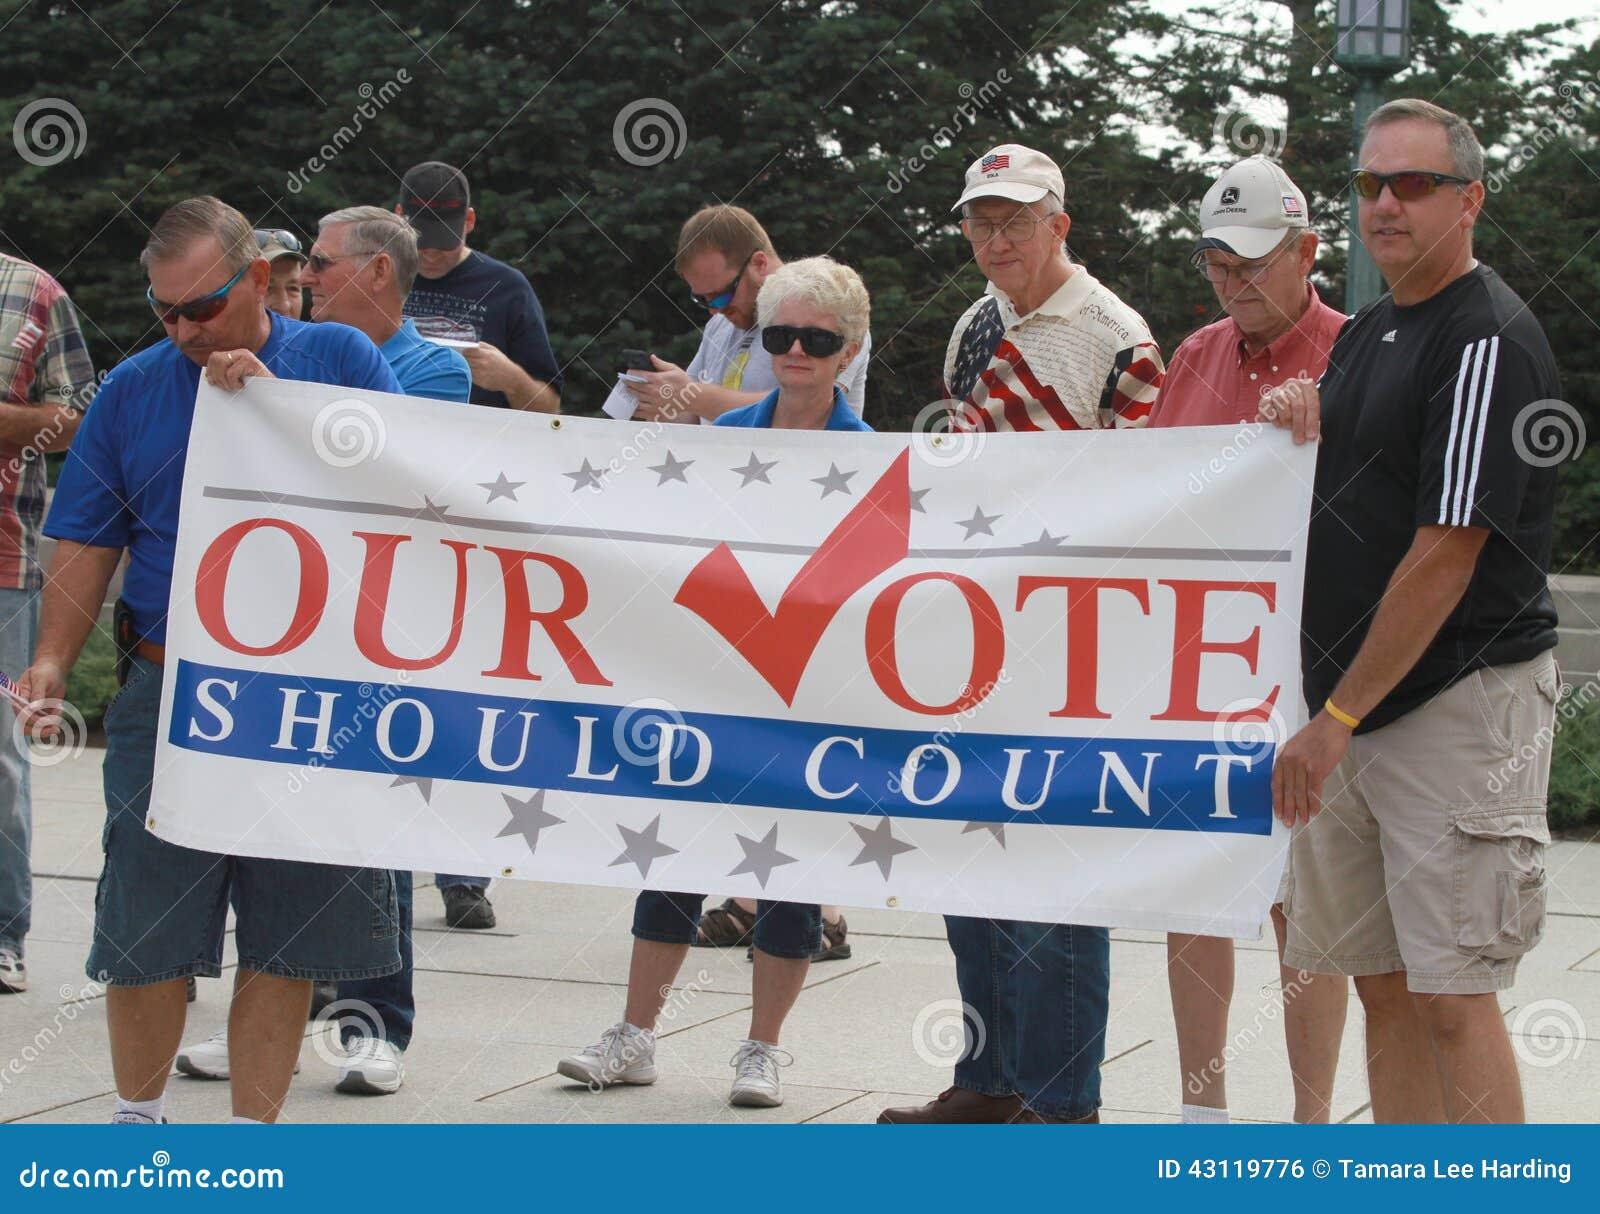 Should more people vote